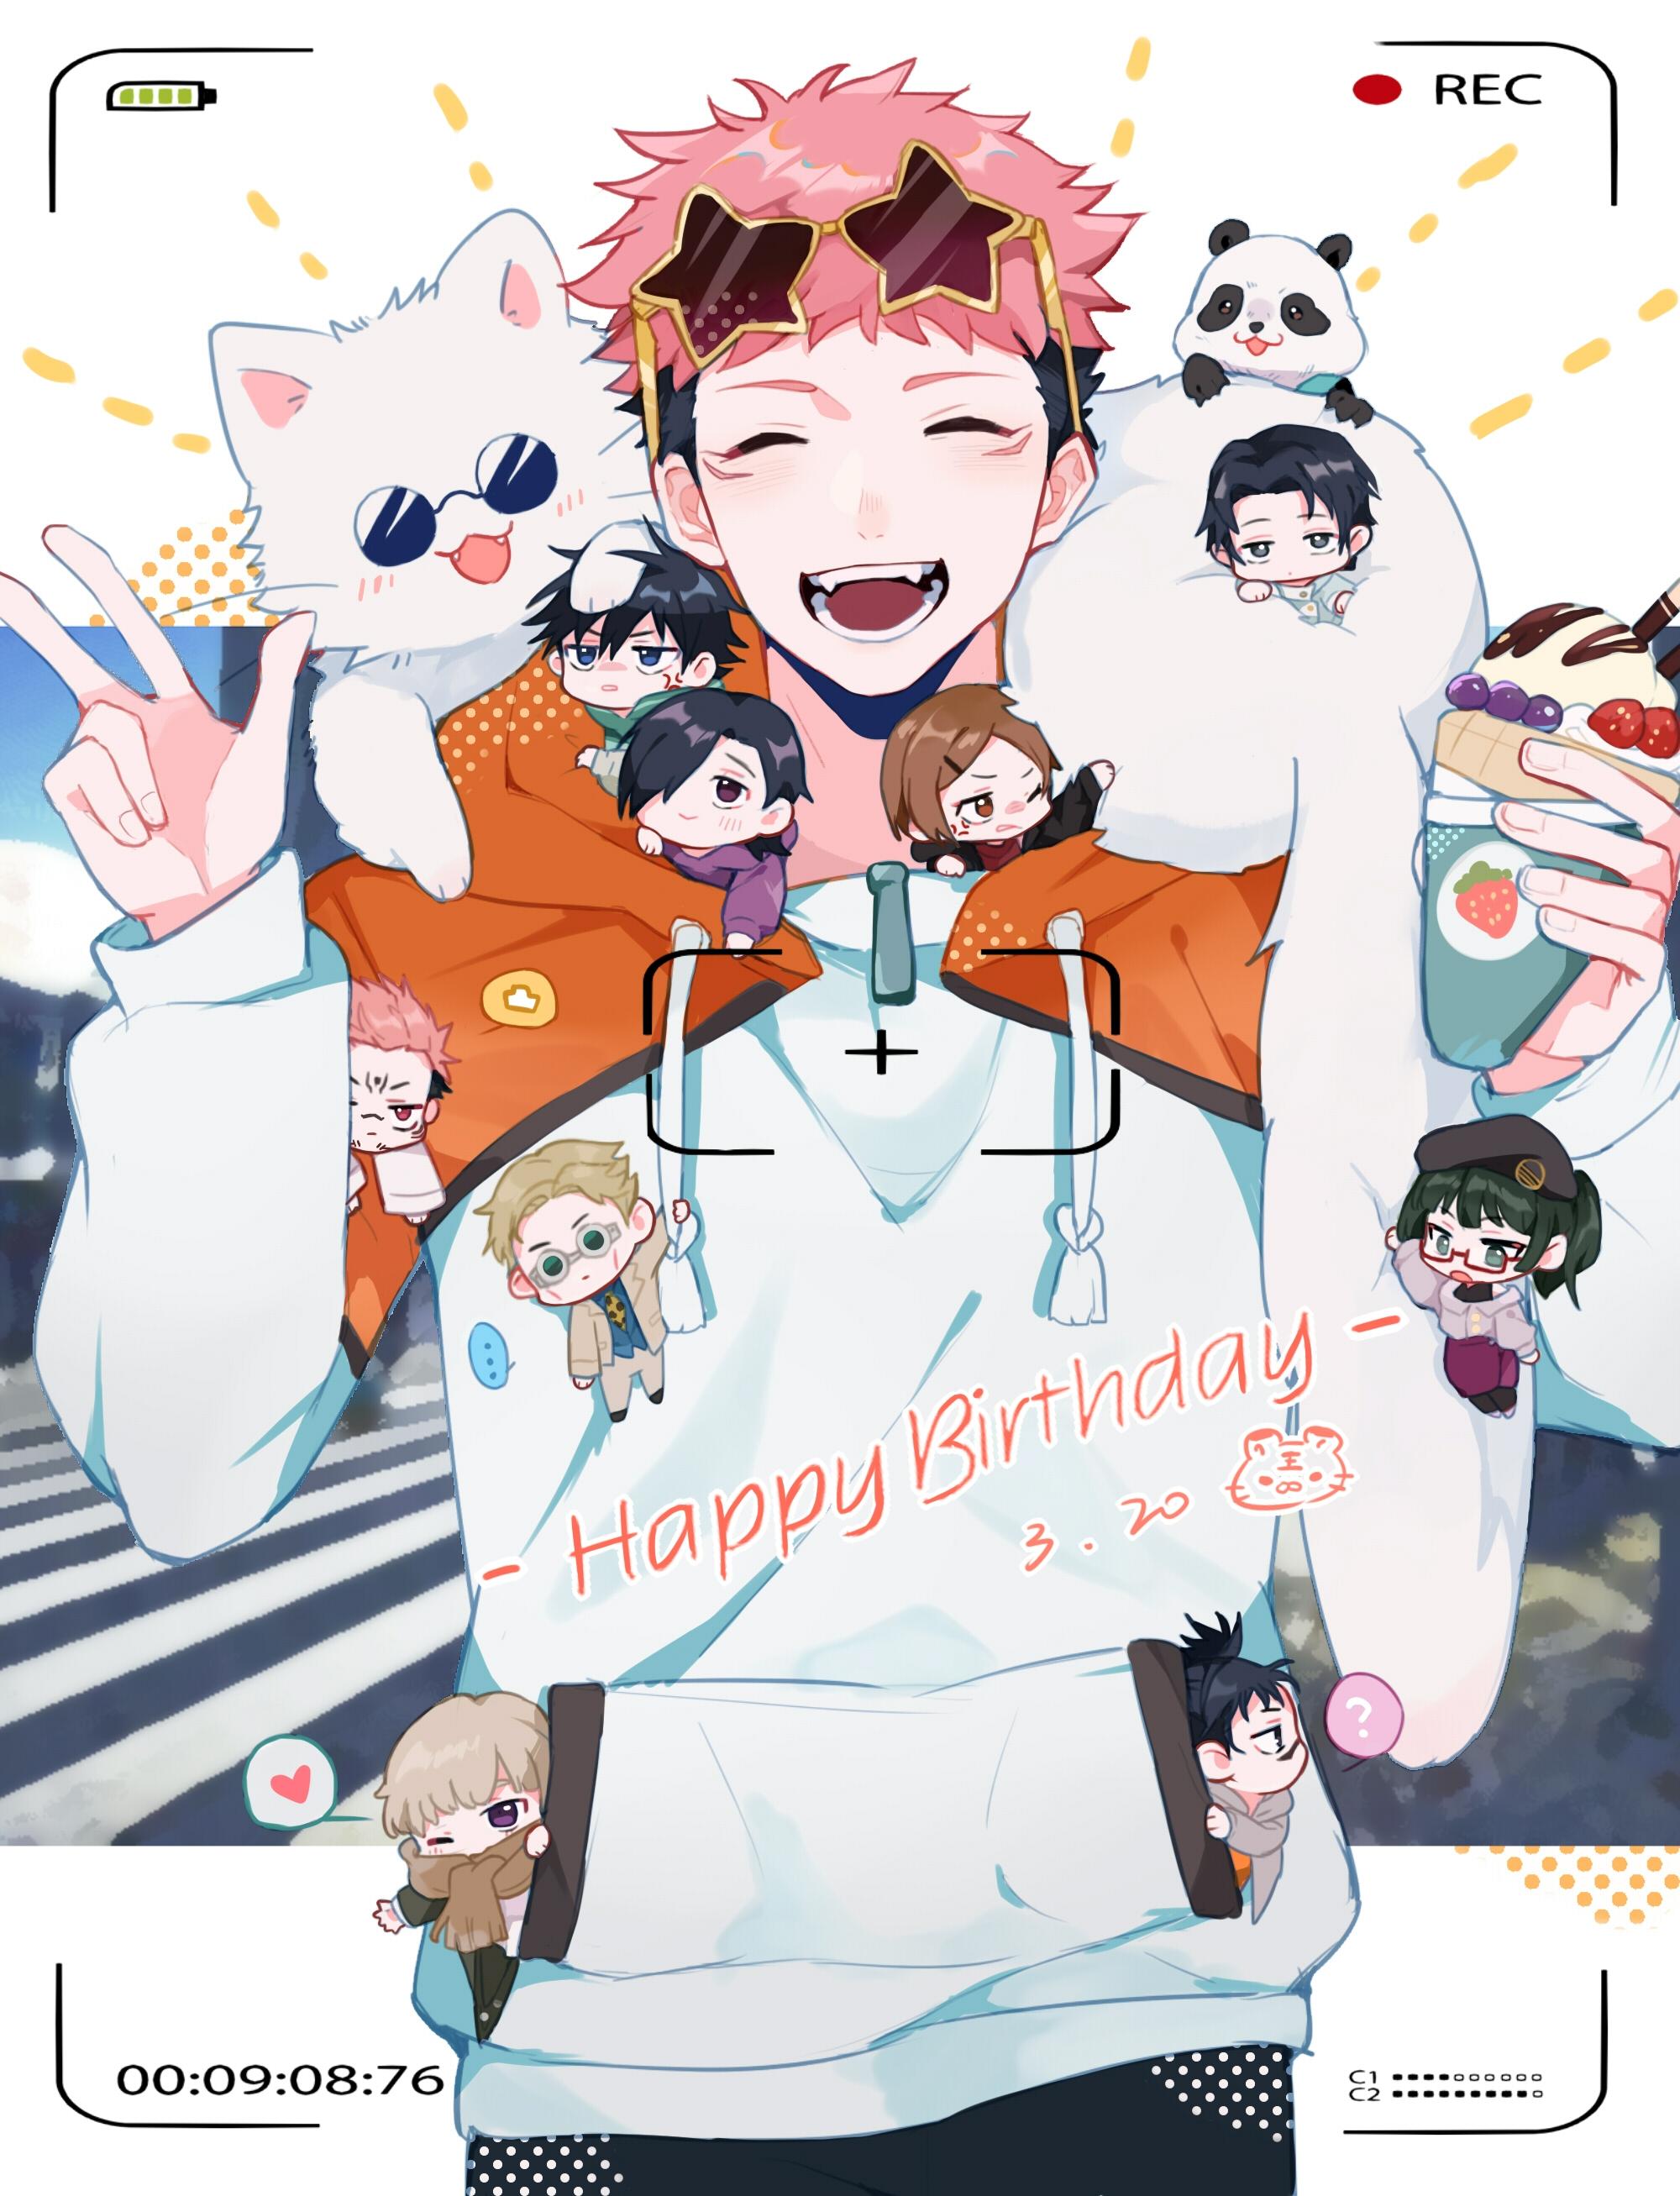 Jujutsu Kaisen Image 3264305 Zerochan Anime Image Board